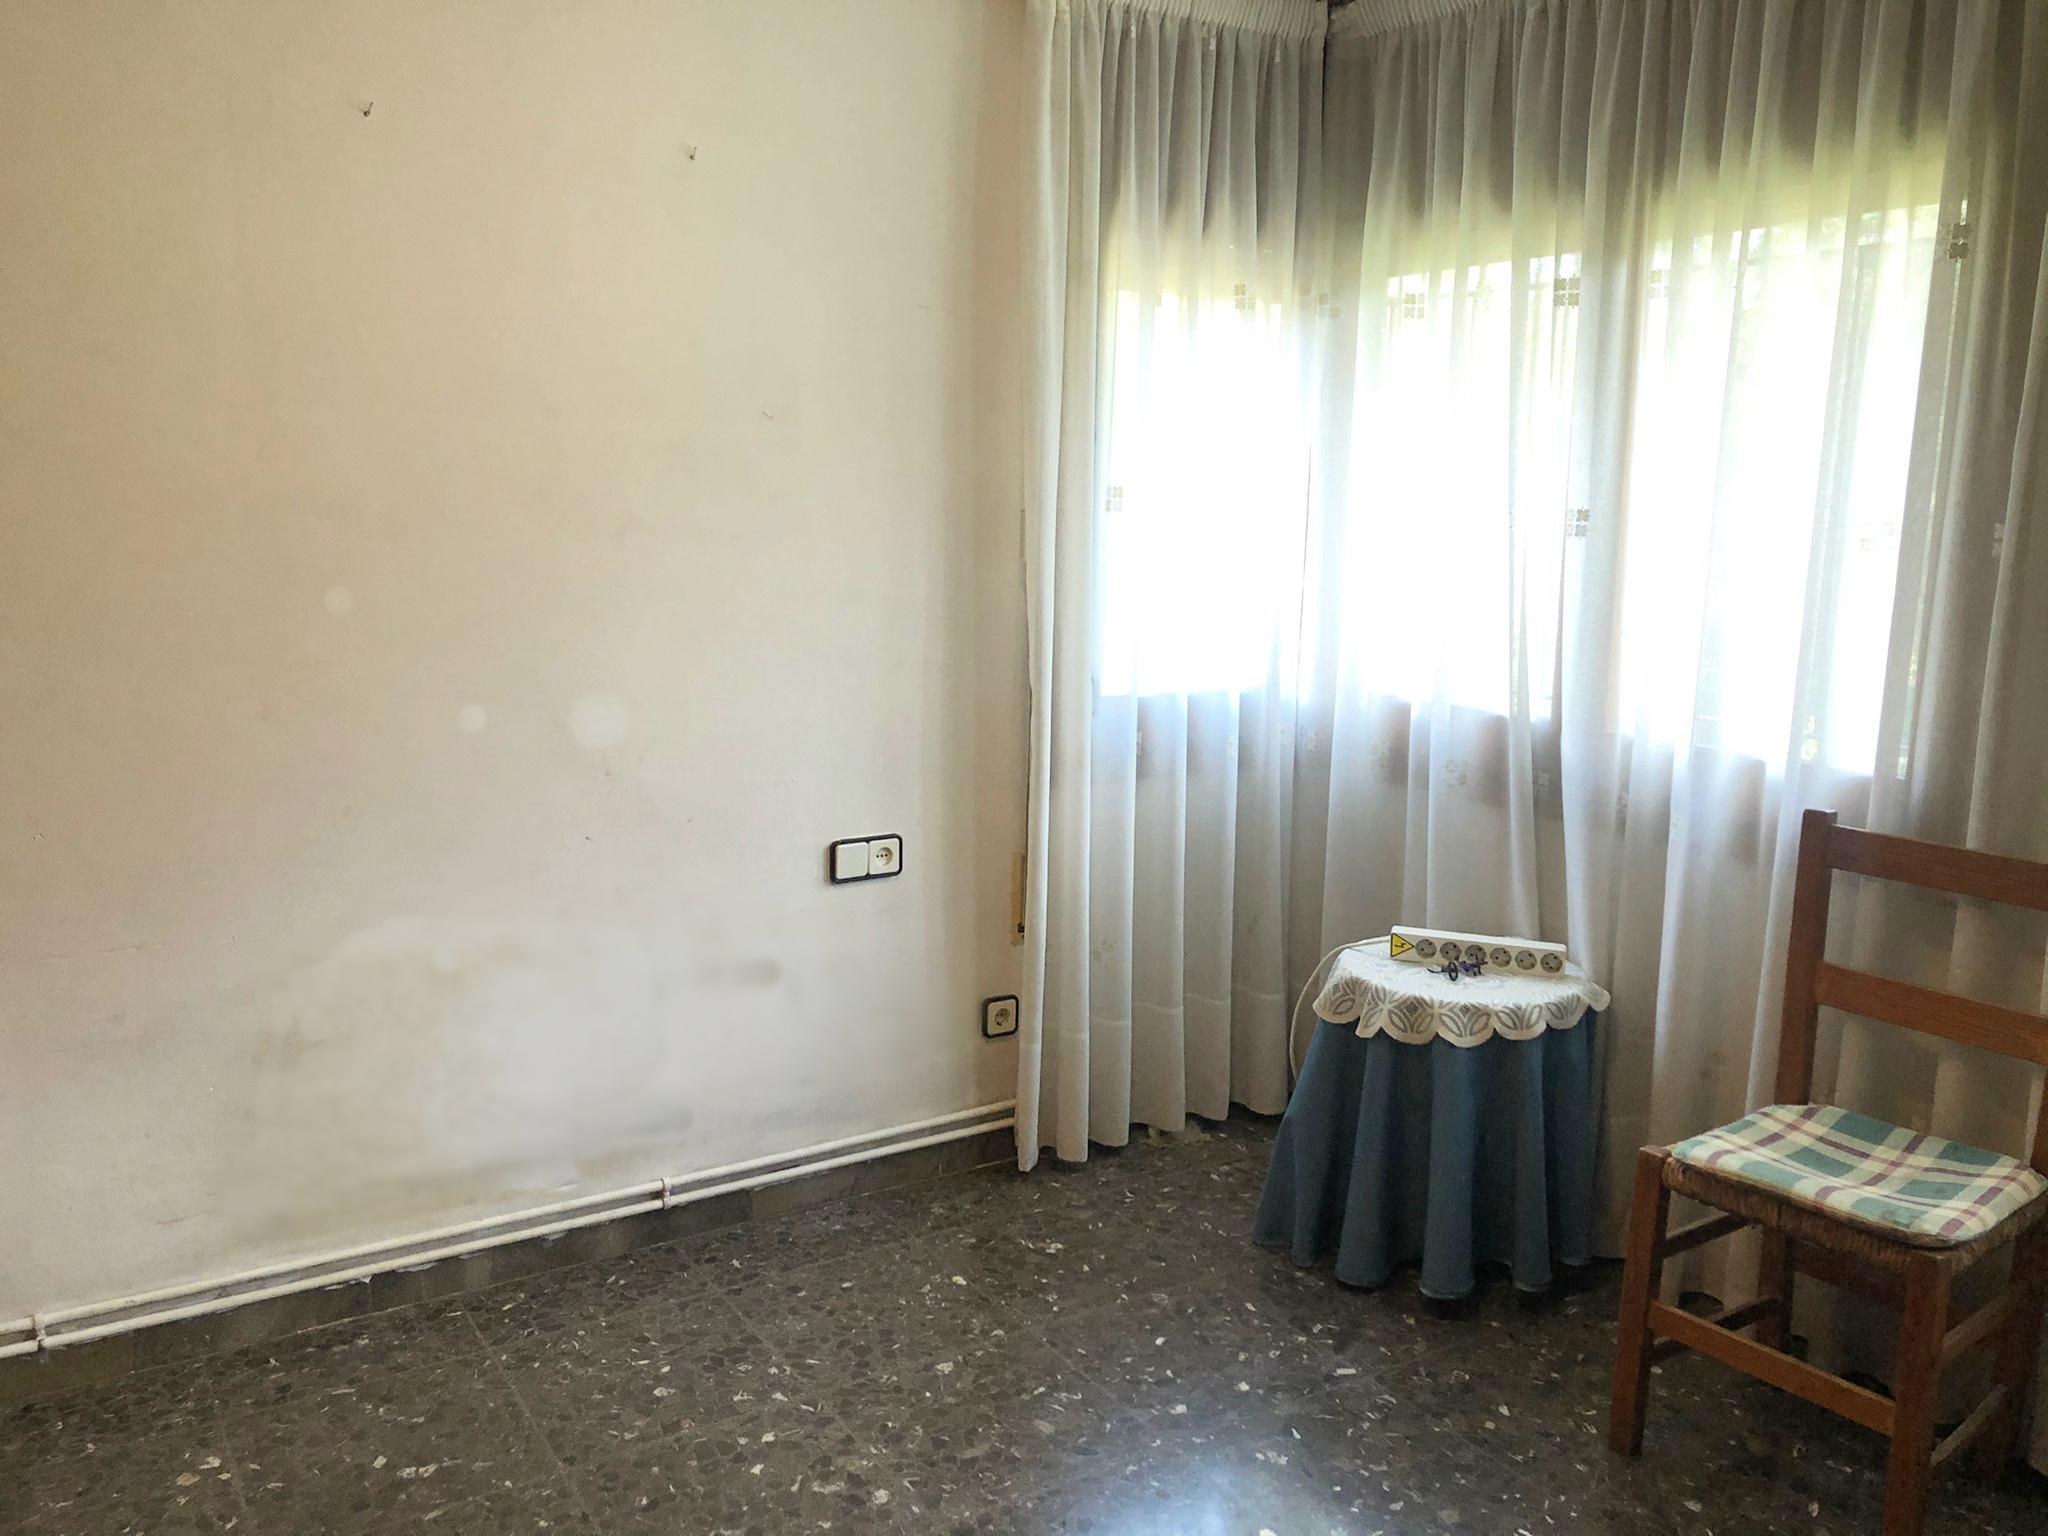 Imagen 4 Casa Aislada en venta en Montornès Del Vallès / Montornes del Valles- 2 viviendas-2 parcelas